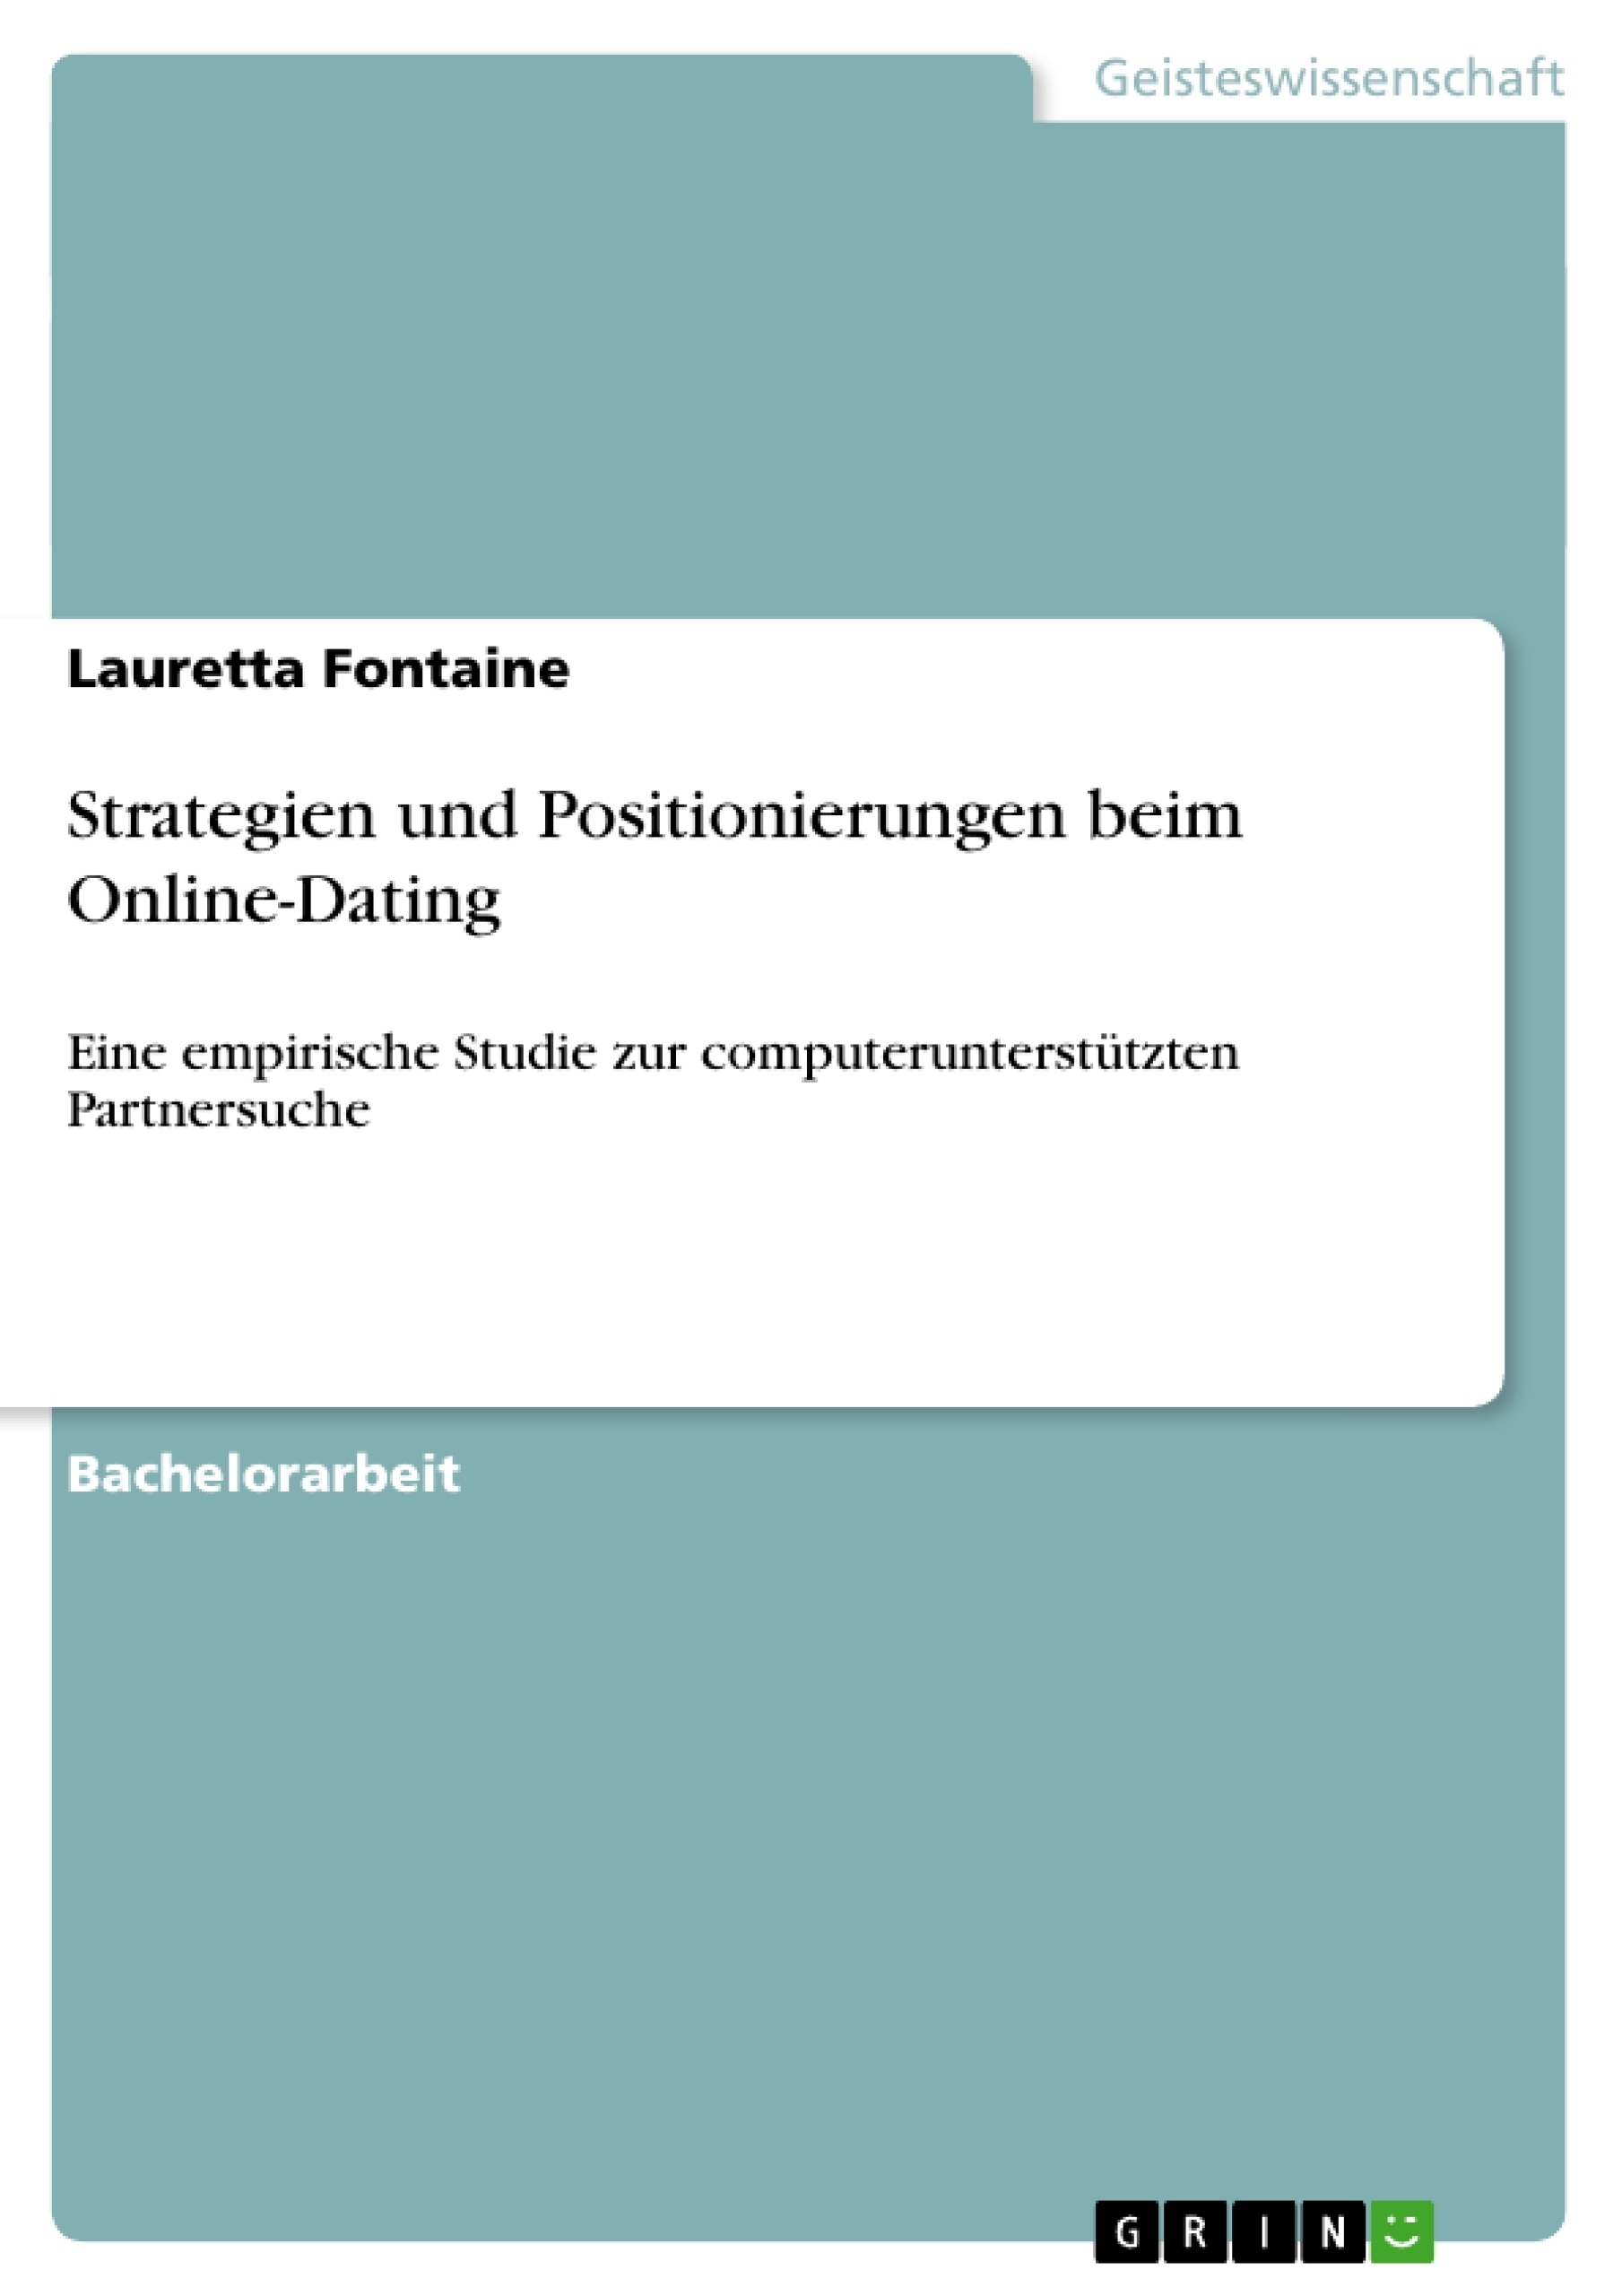 Online-Dating-Erfolgsstatistik